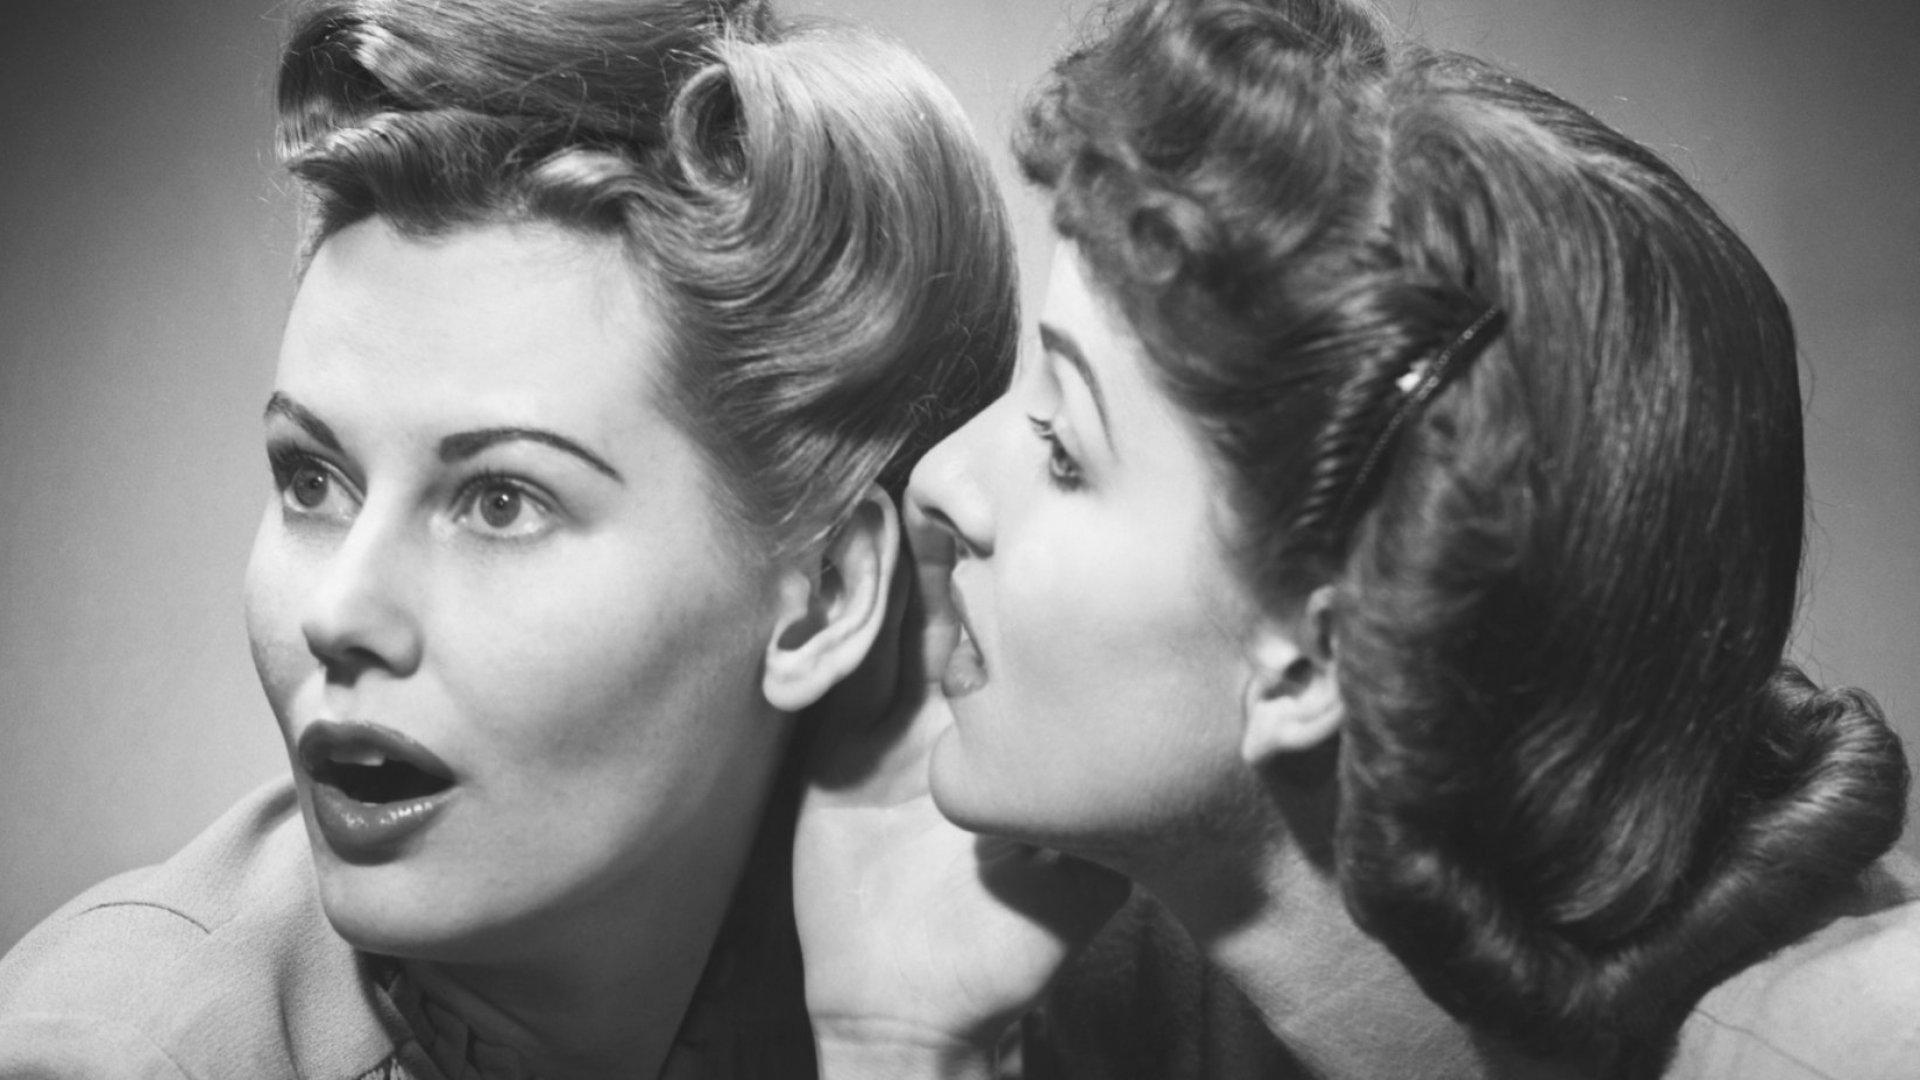 6 Ways to Nix Gossiping at Work